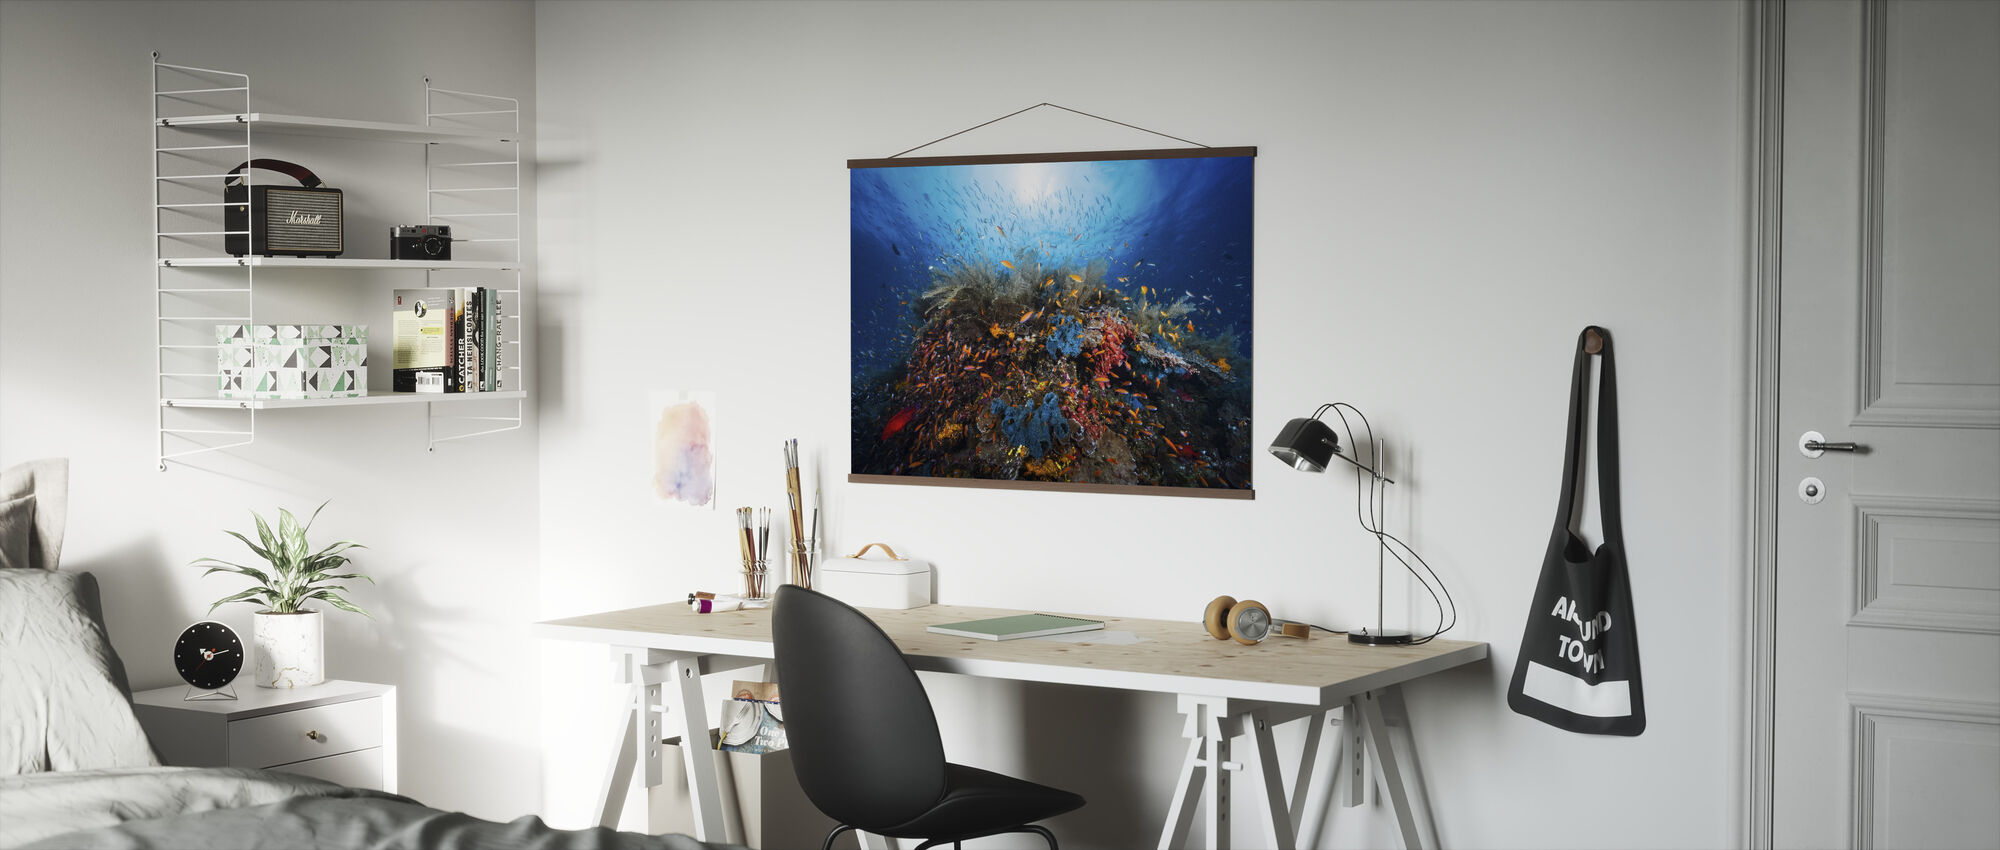 Apnea - Poster - Office